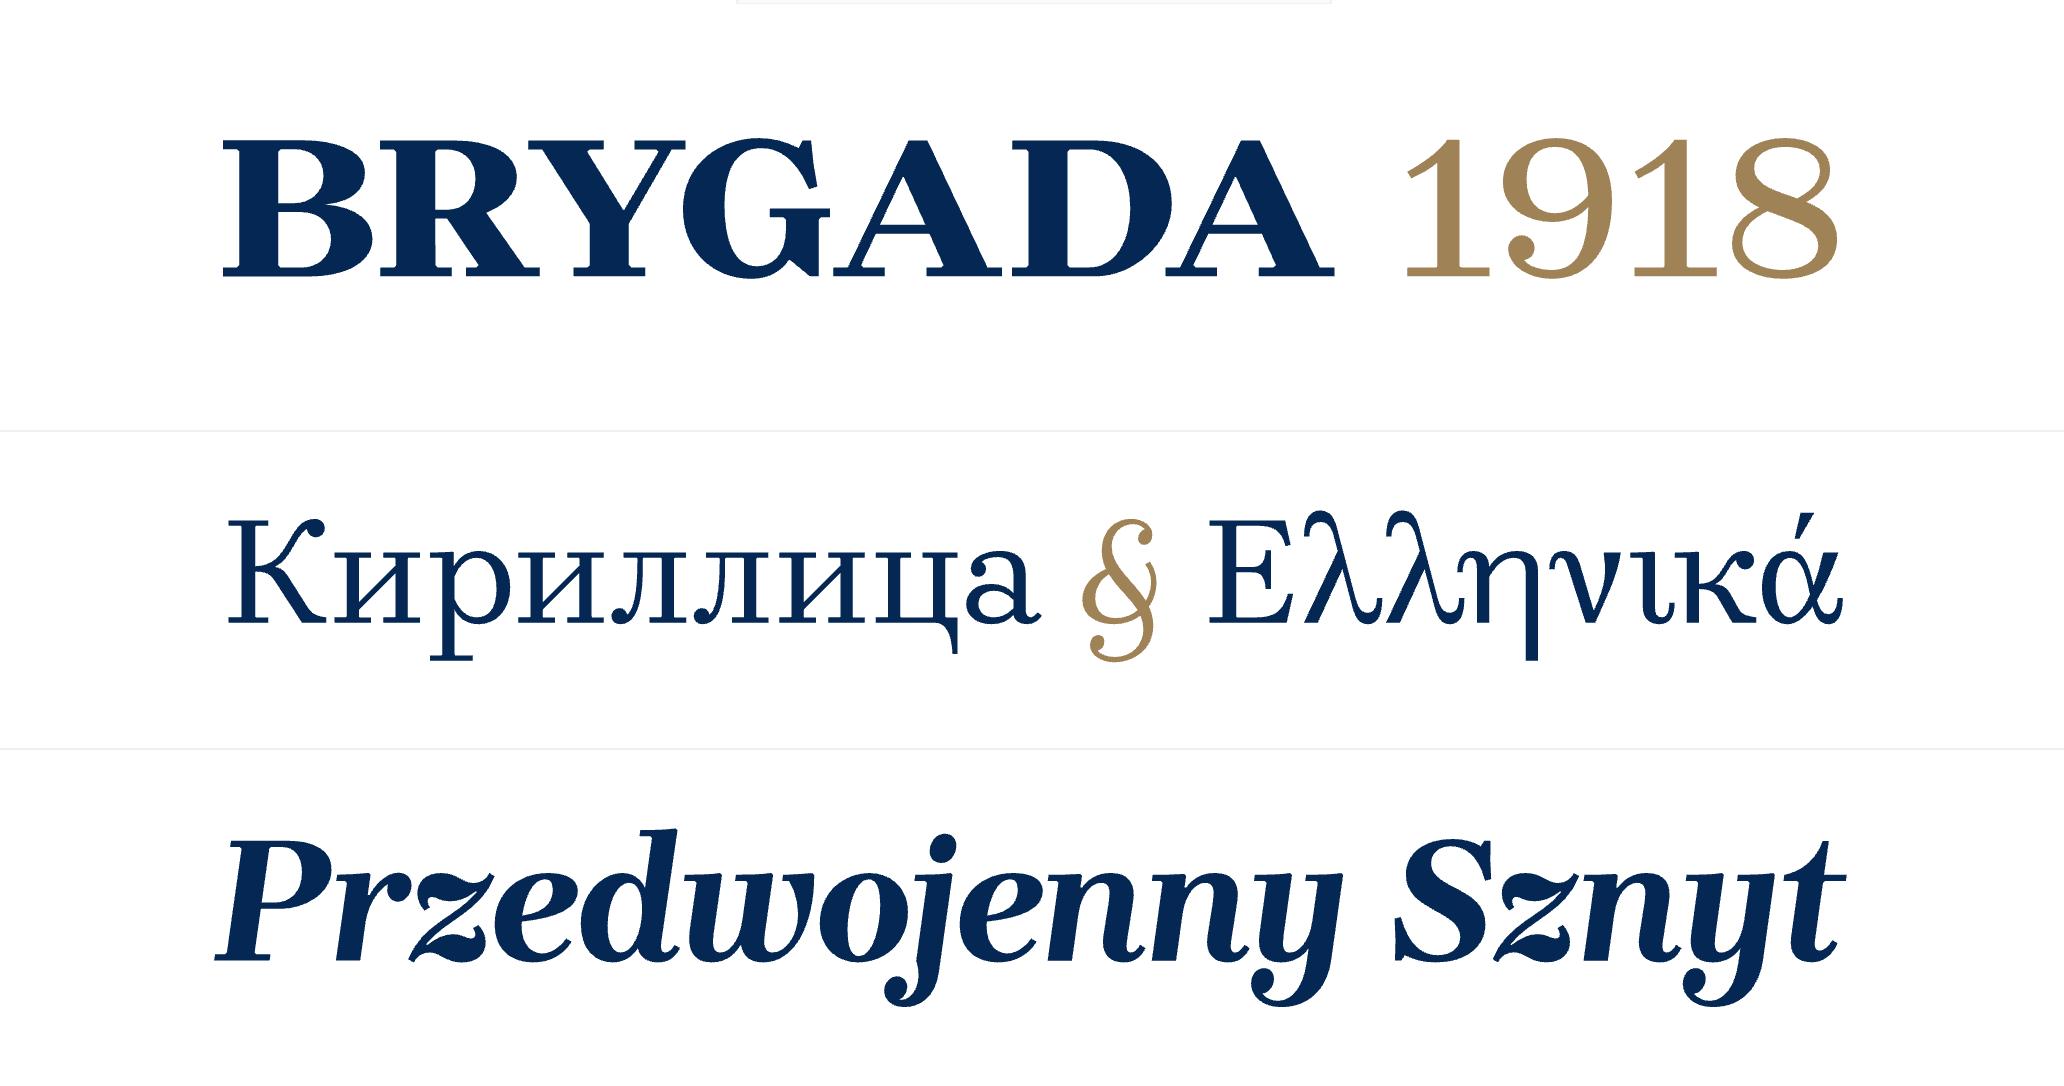 Brygada 1918 Typeface